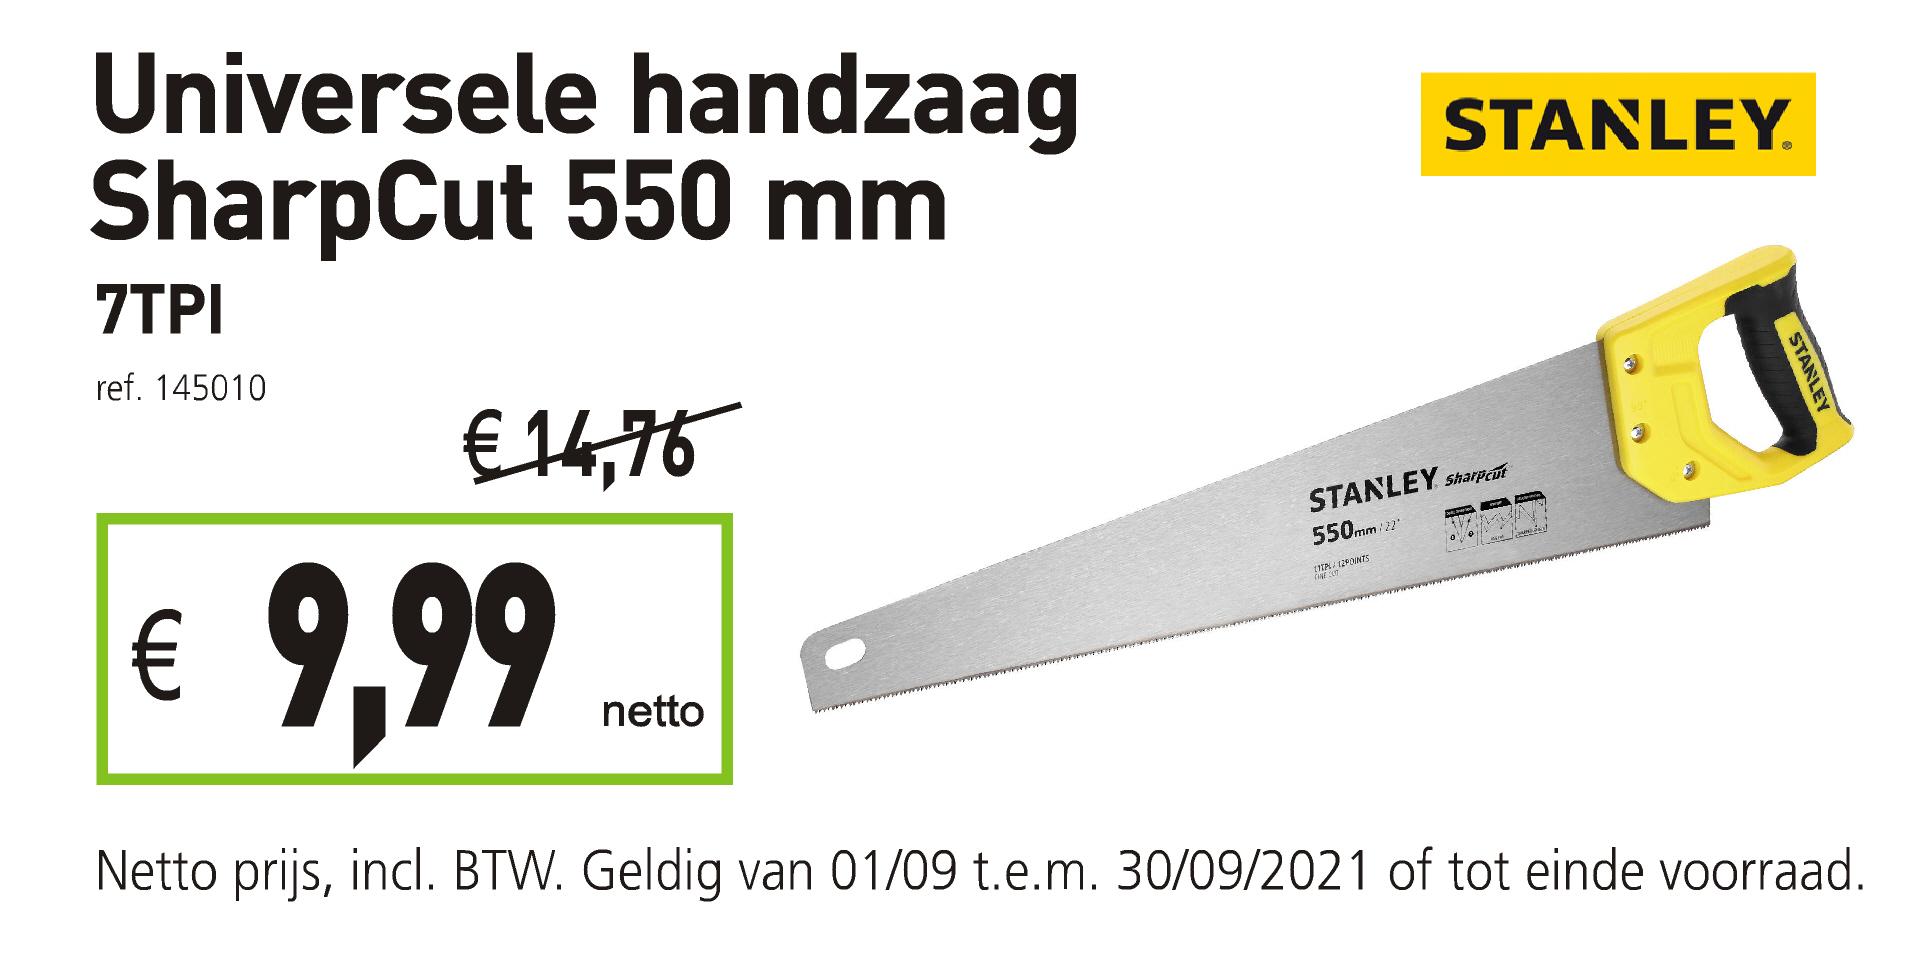 Stanley universele handzaag sharpcut 550 mm 7TPI